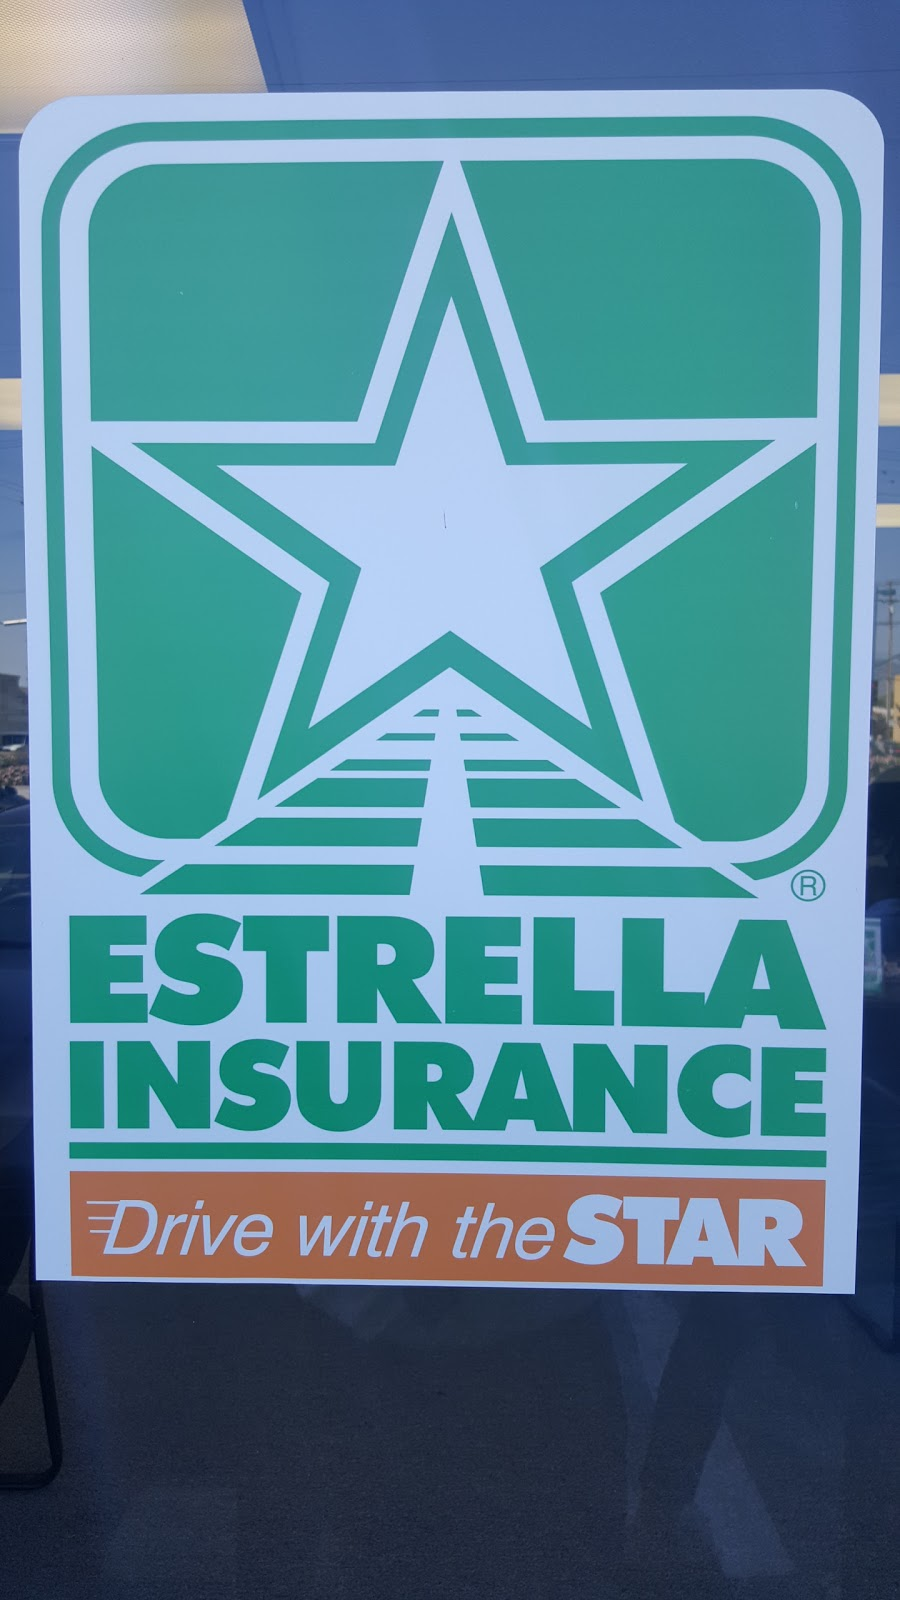 Estrella Insurance | insurance agency | 1075 N Western Ave, Los Angeles, CA 90029, USA | 3234898122 OR +1 323-489-8122